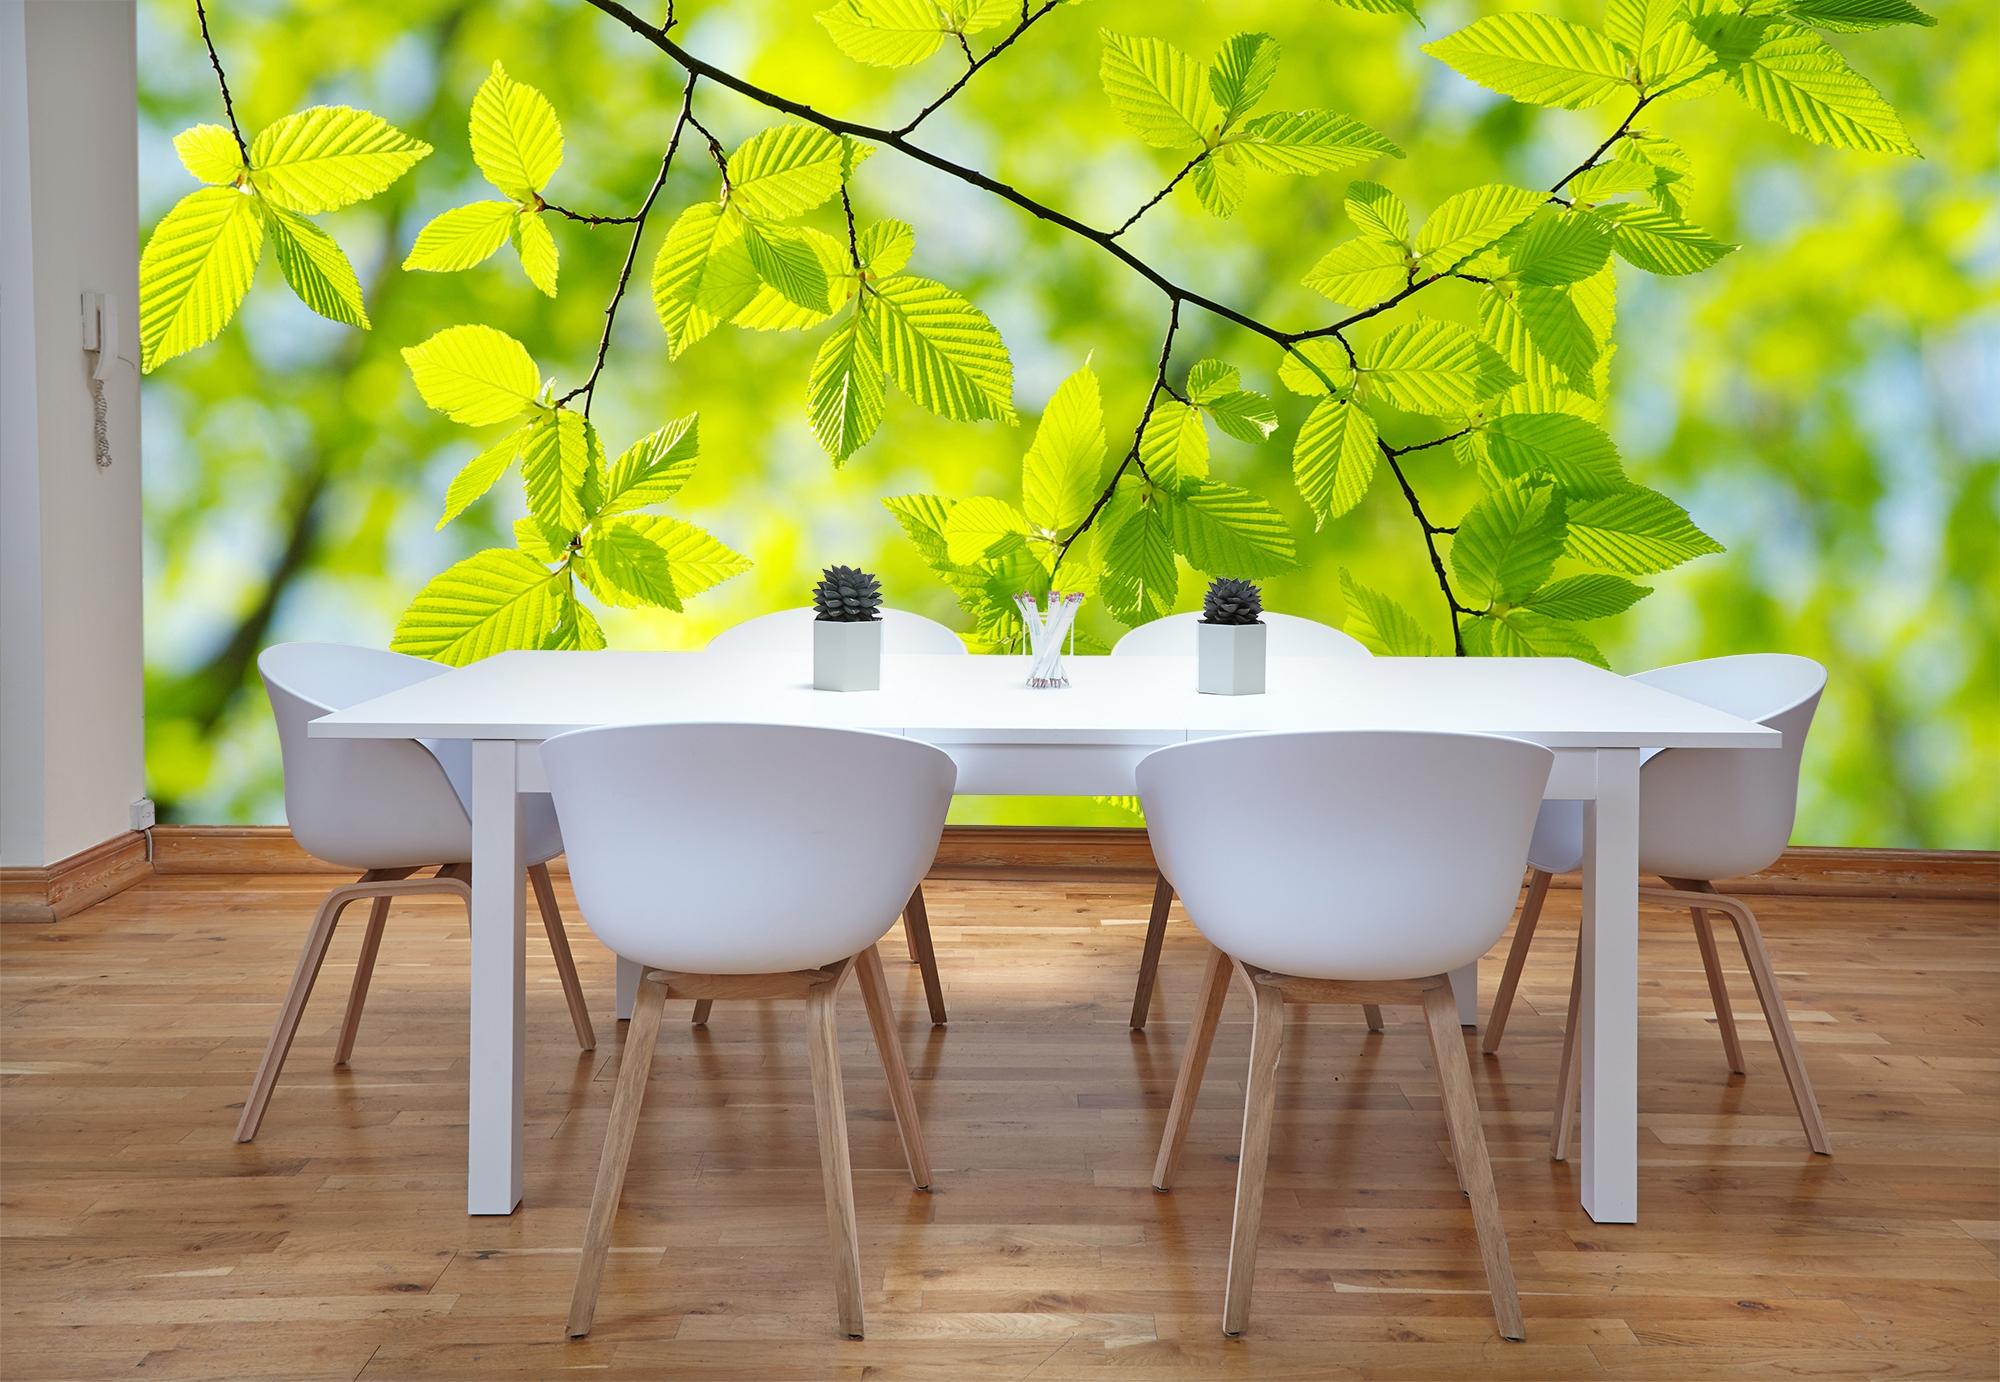 Vlies fotobehang Lente groen